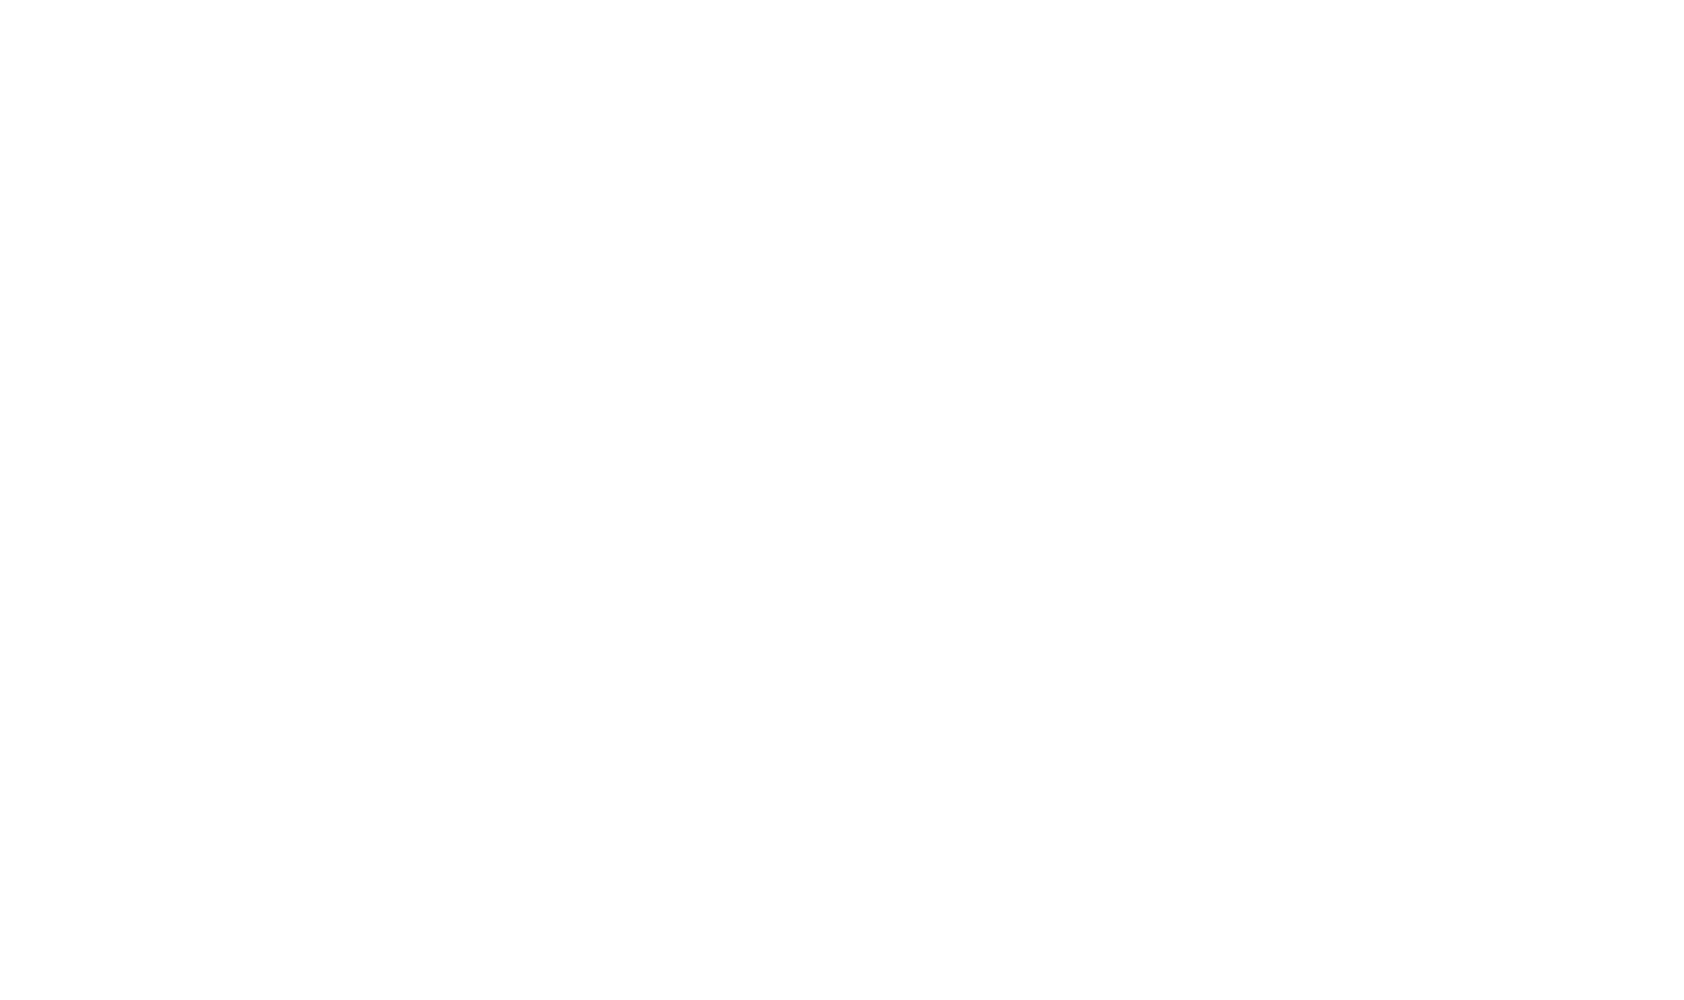 Dutch Coding Company